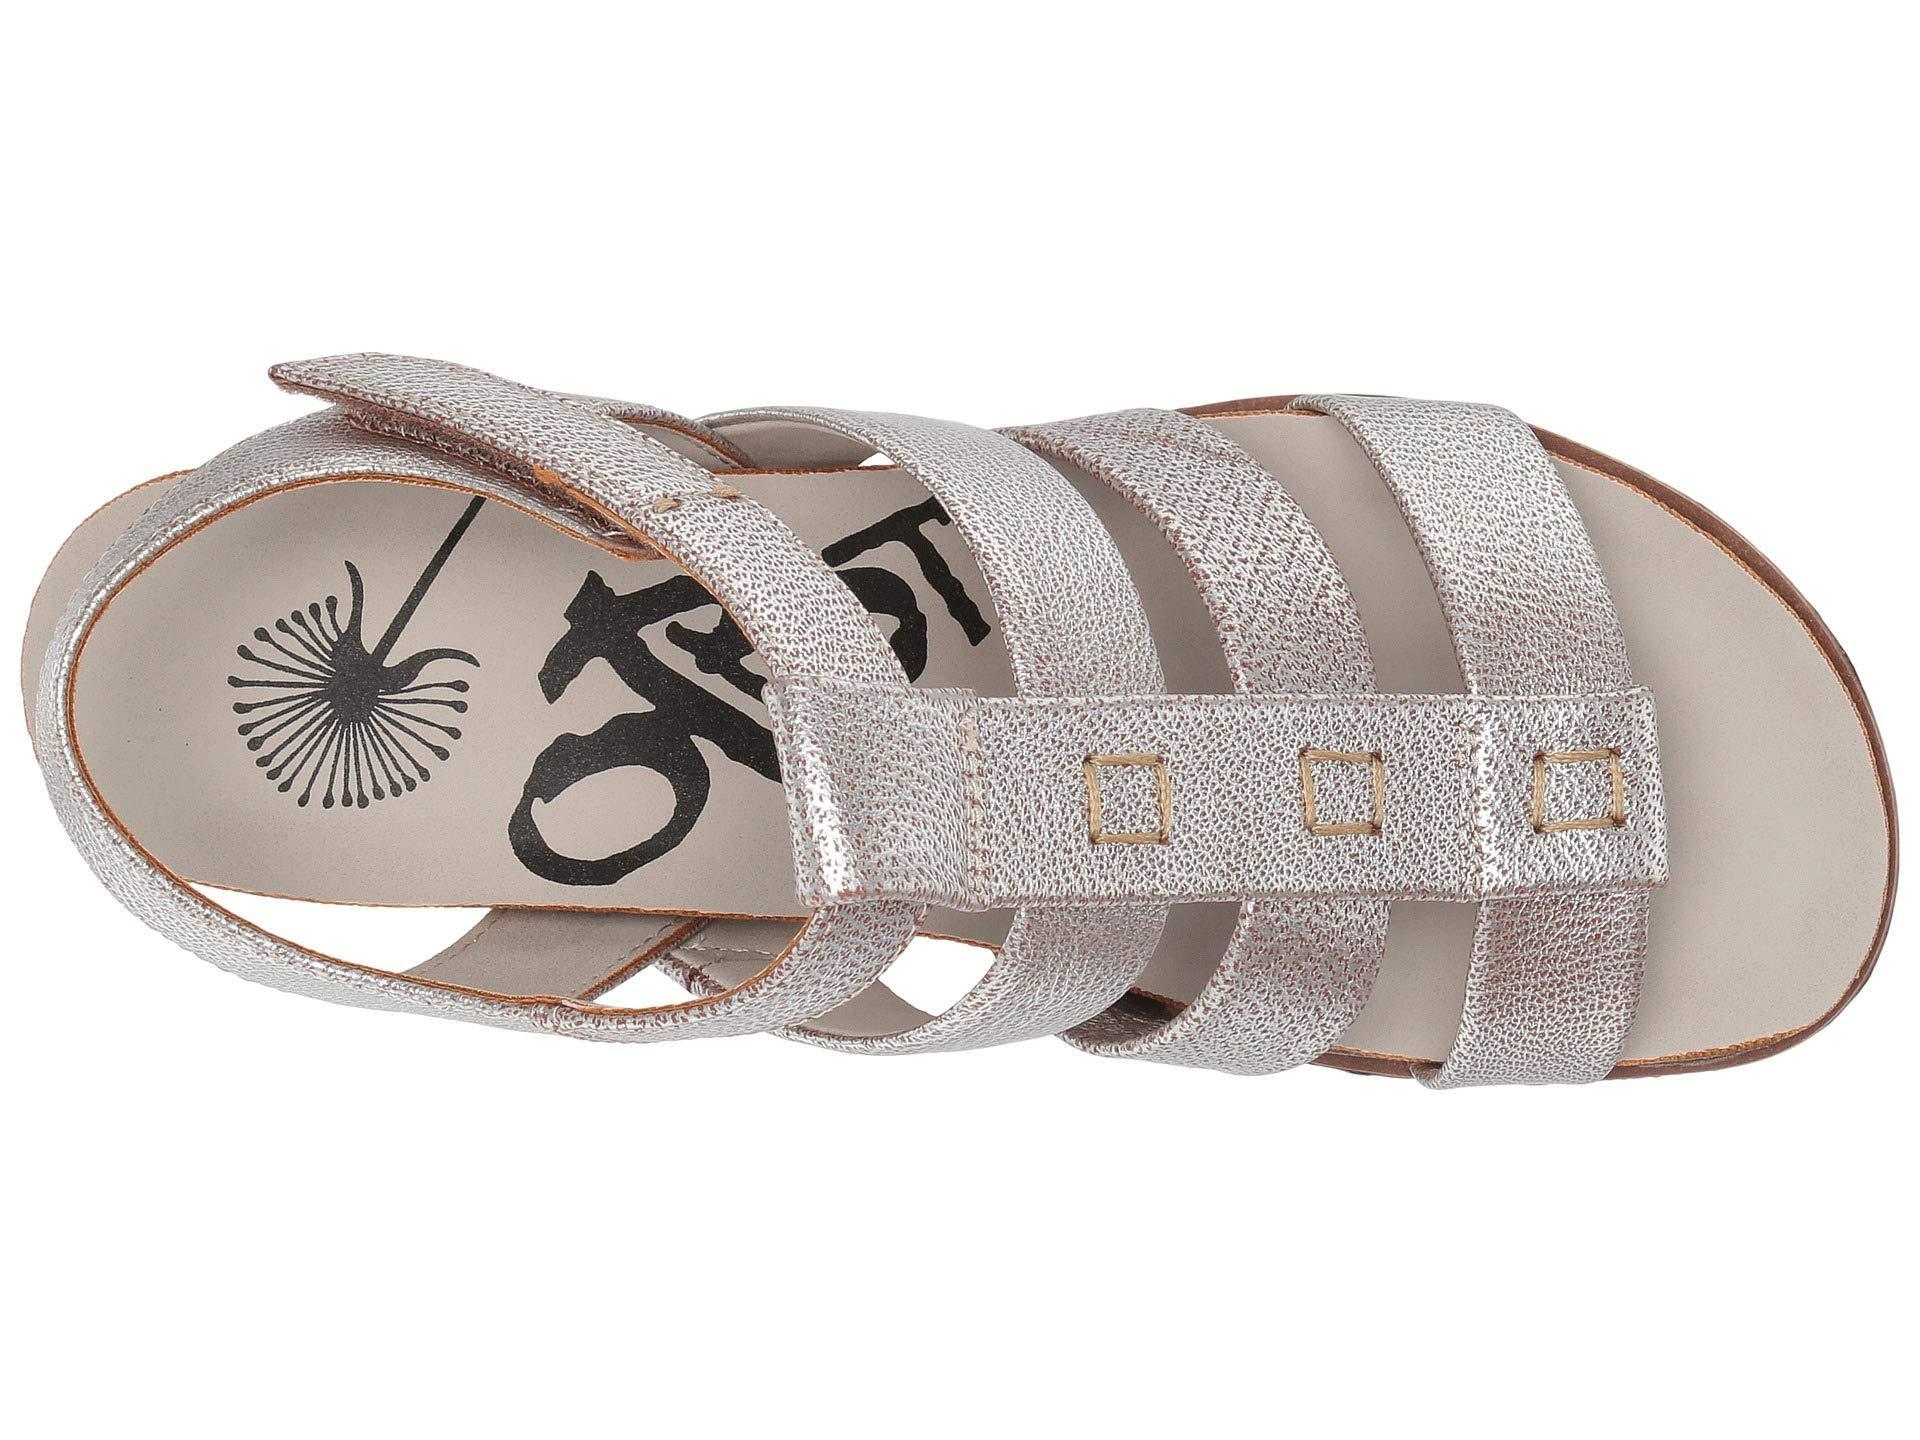 bdcf96339fe Otbt - Metallic New Moon (silver) Women s Wedge Shoes - Lyst. View  fullscreen